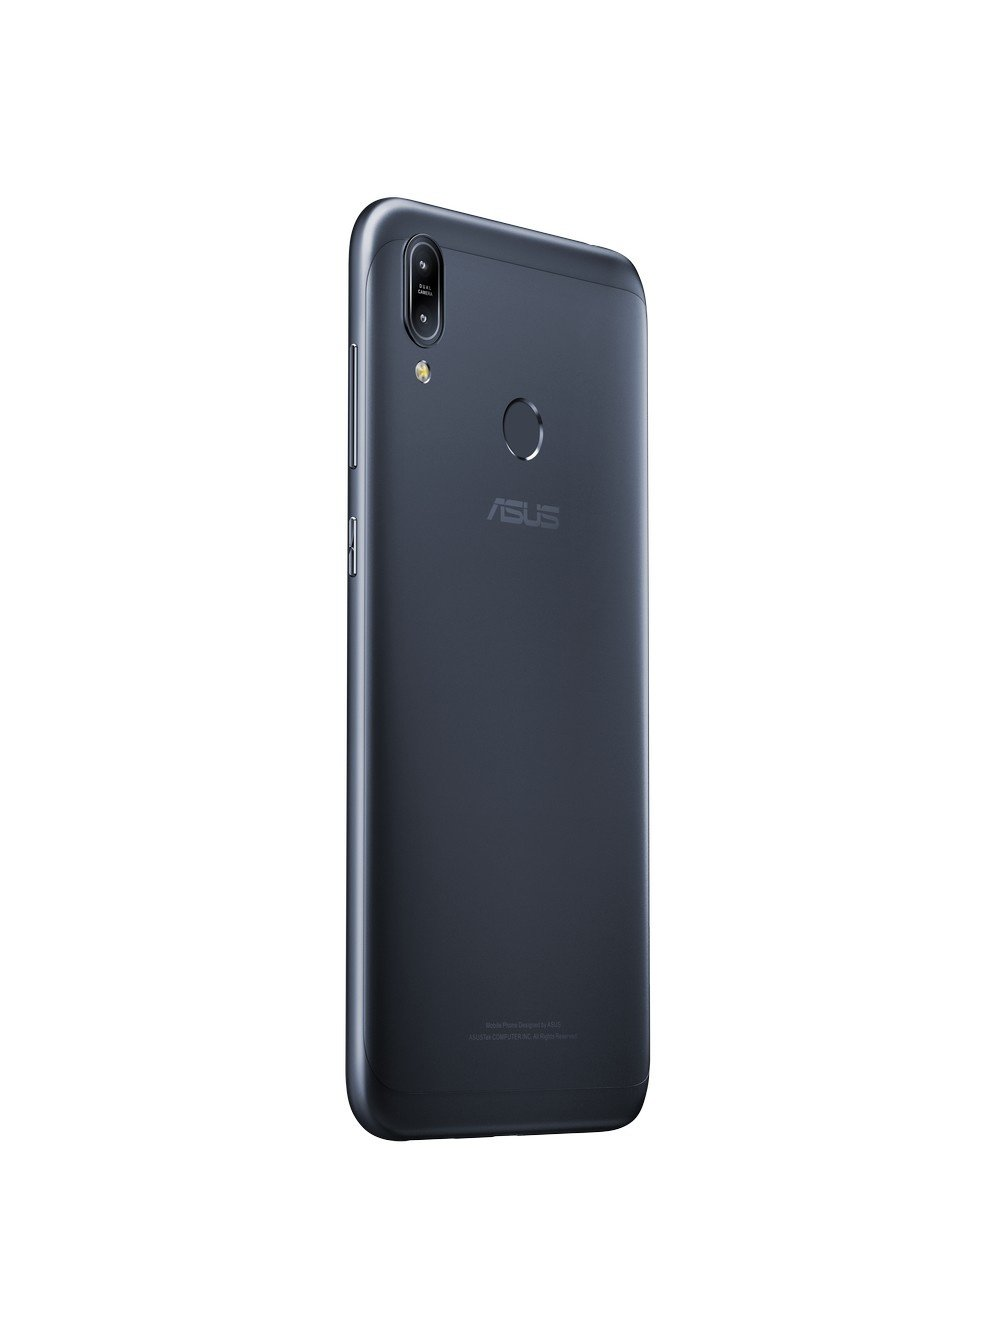 Смартфон Asus ZenFone Max (M2) (ZB633KL-4A070EU) 4/32 GB DUALSIM Black с чехлом фото 9